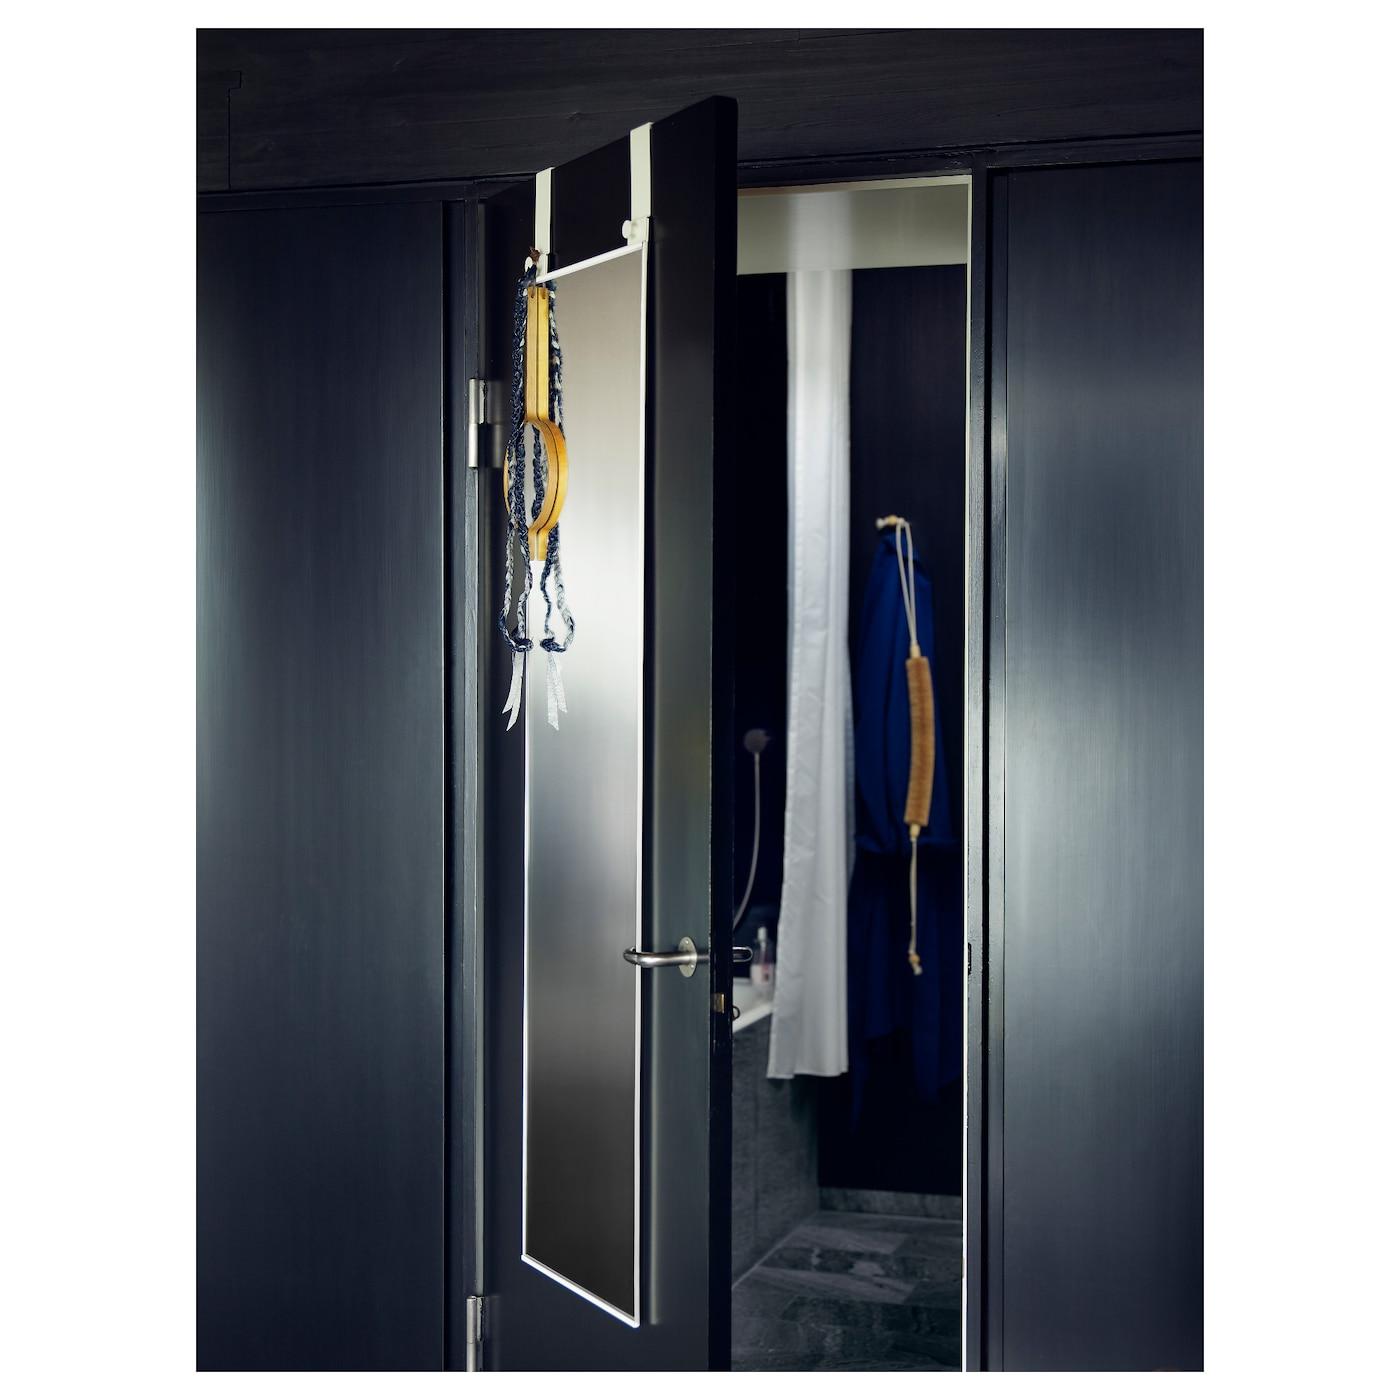 garnes over the door mirror white 38x155 cm ikea. Black Bedroom Furniture Sets. Home Design Ideas